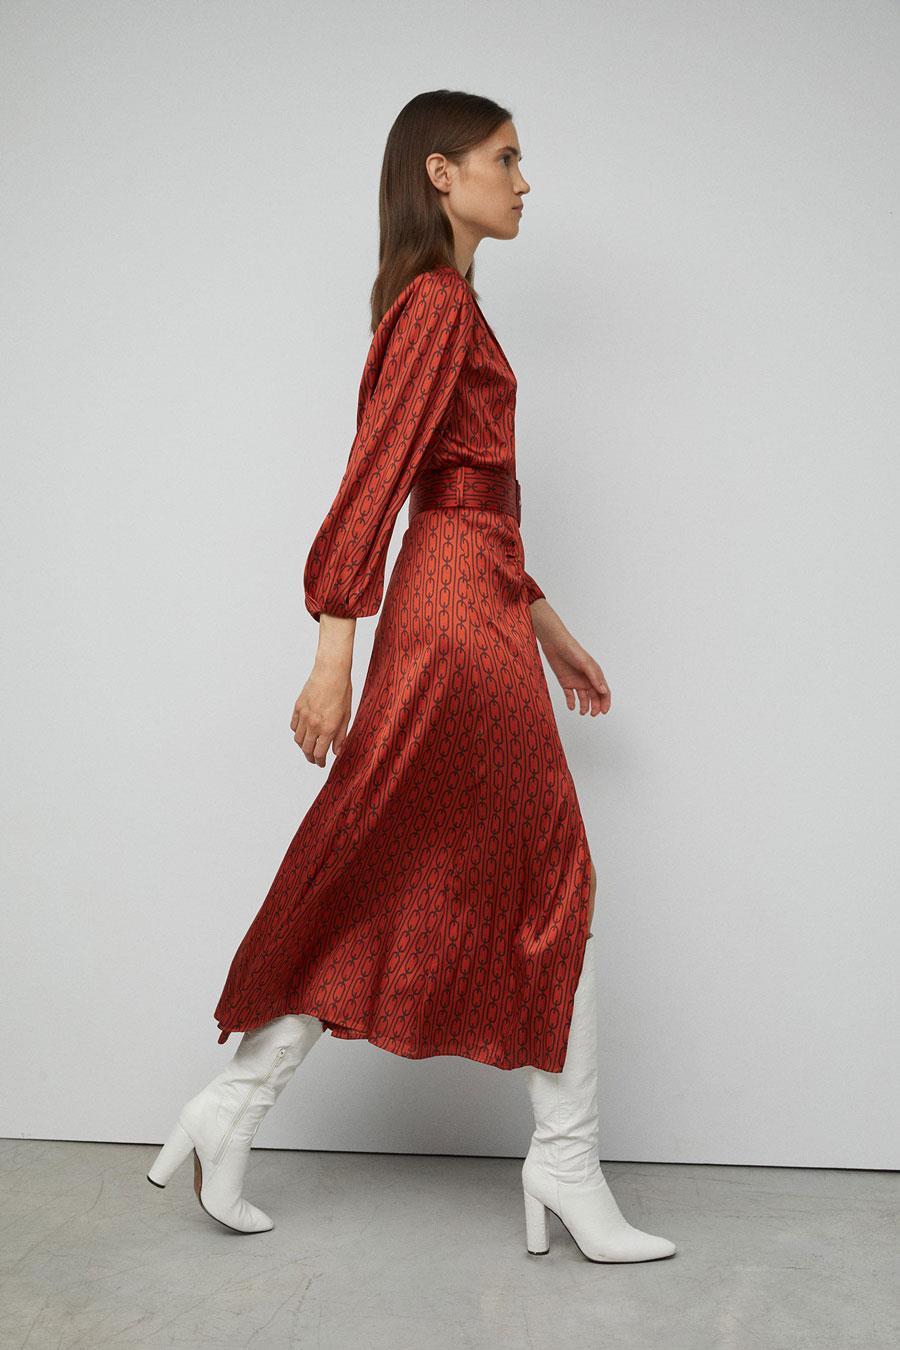 Looks De Moda Otoño 2019 Con Botas Altas En Zara Mango